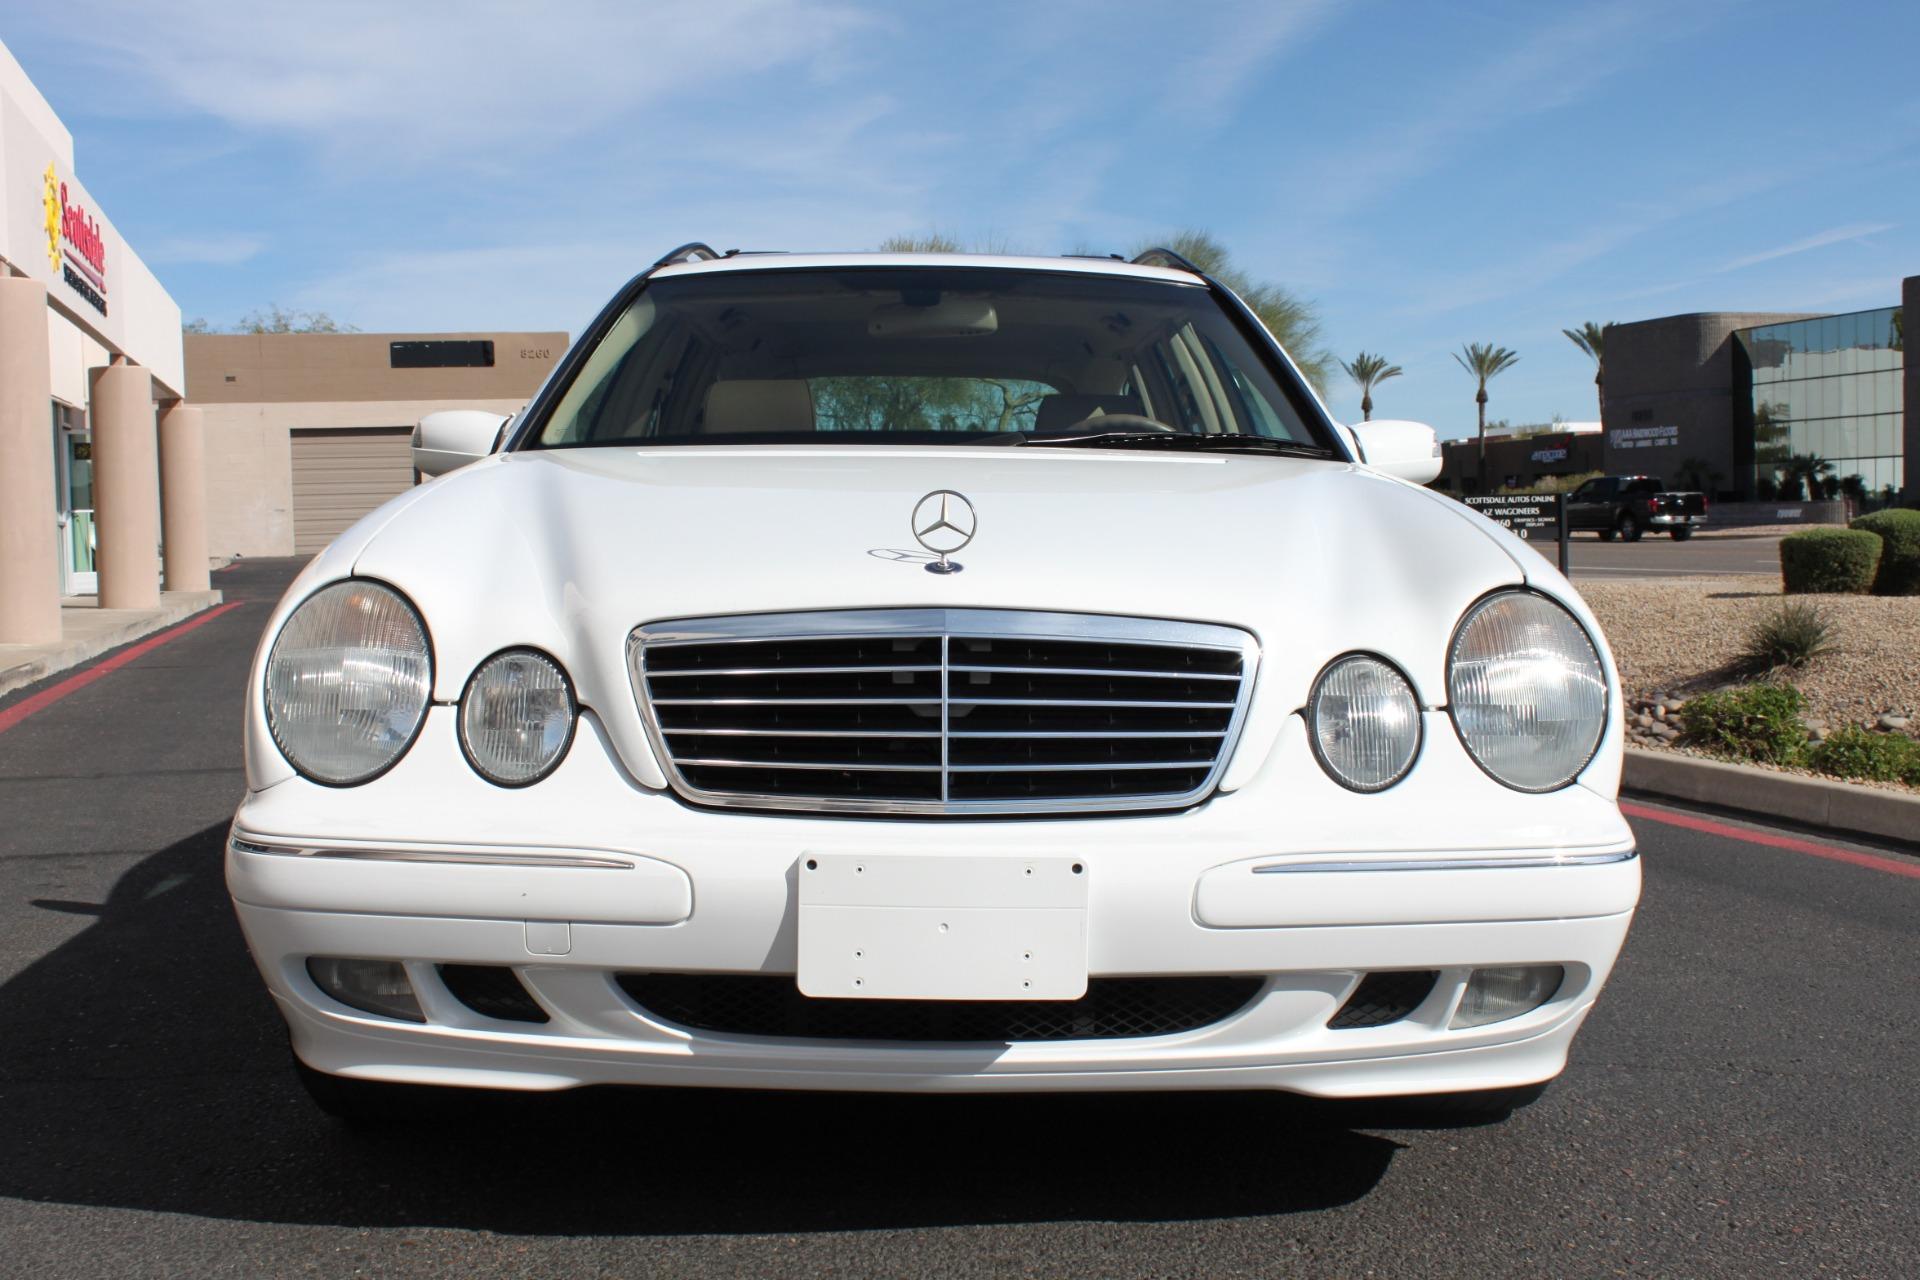 Used-2000-Mercedes-Benz-E-Class-Grand-Cherokee